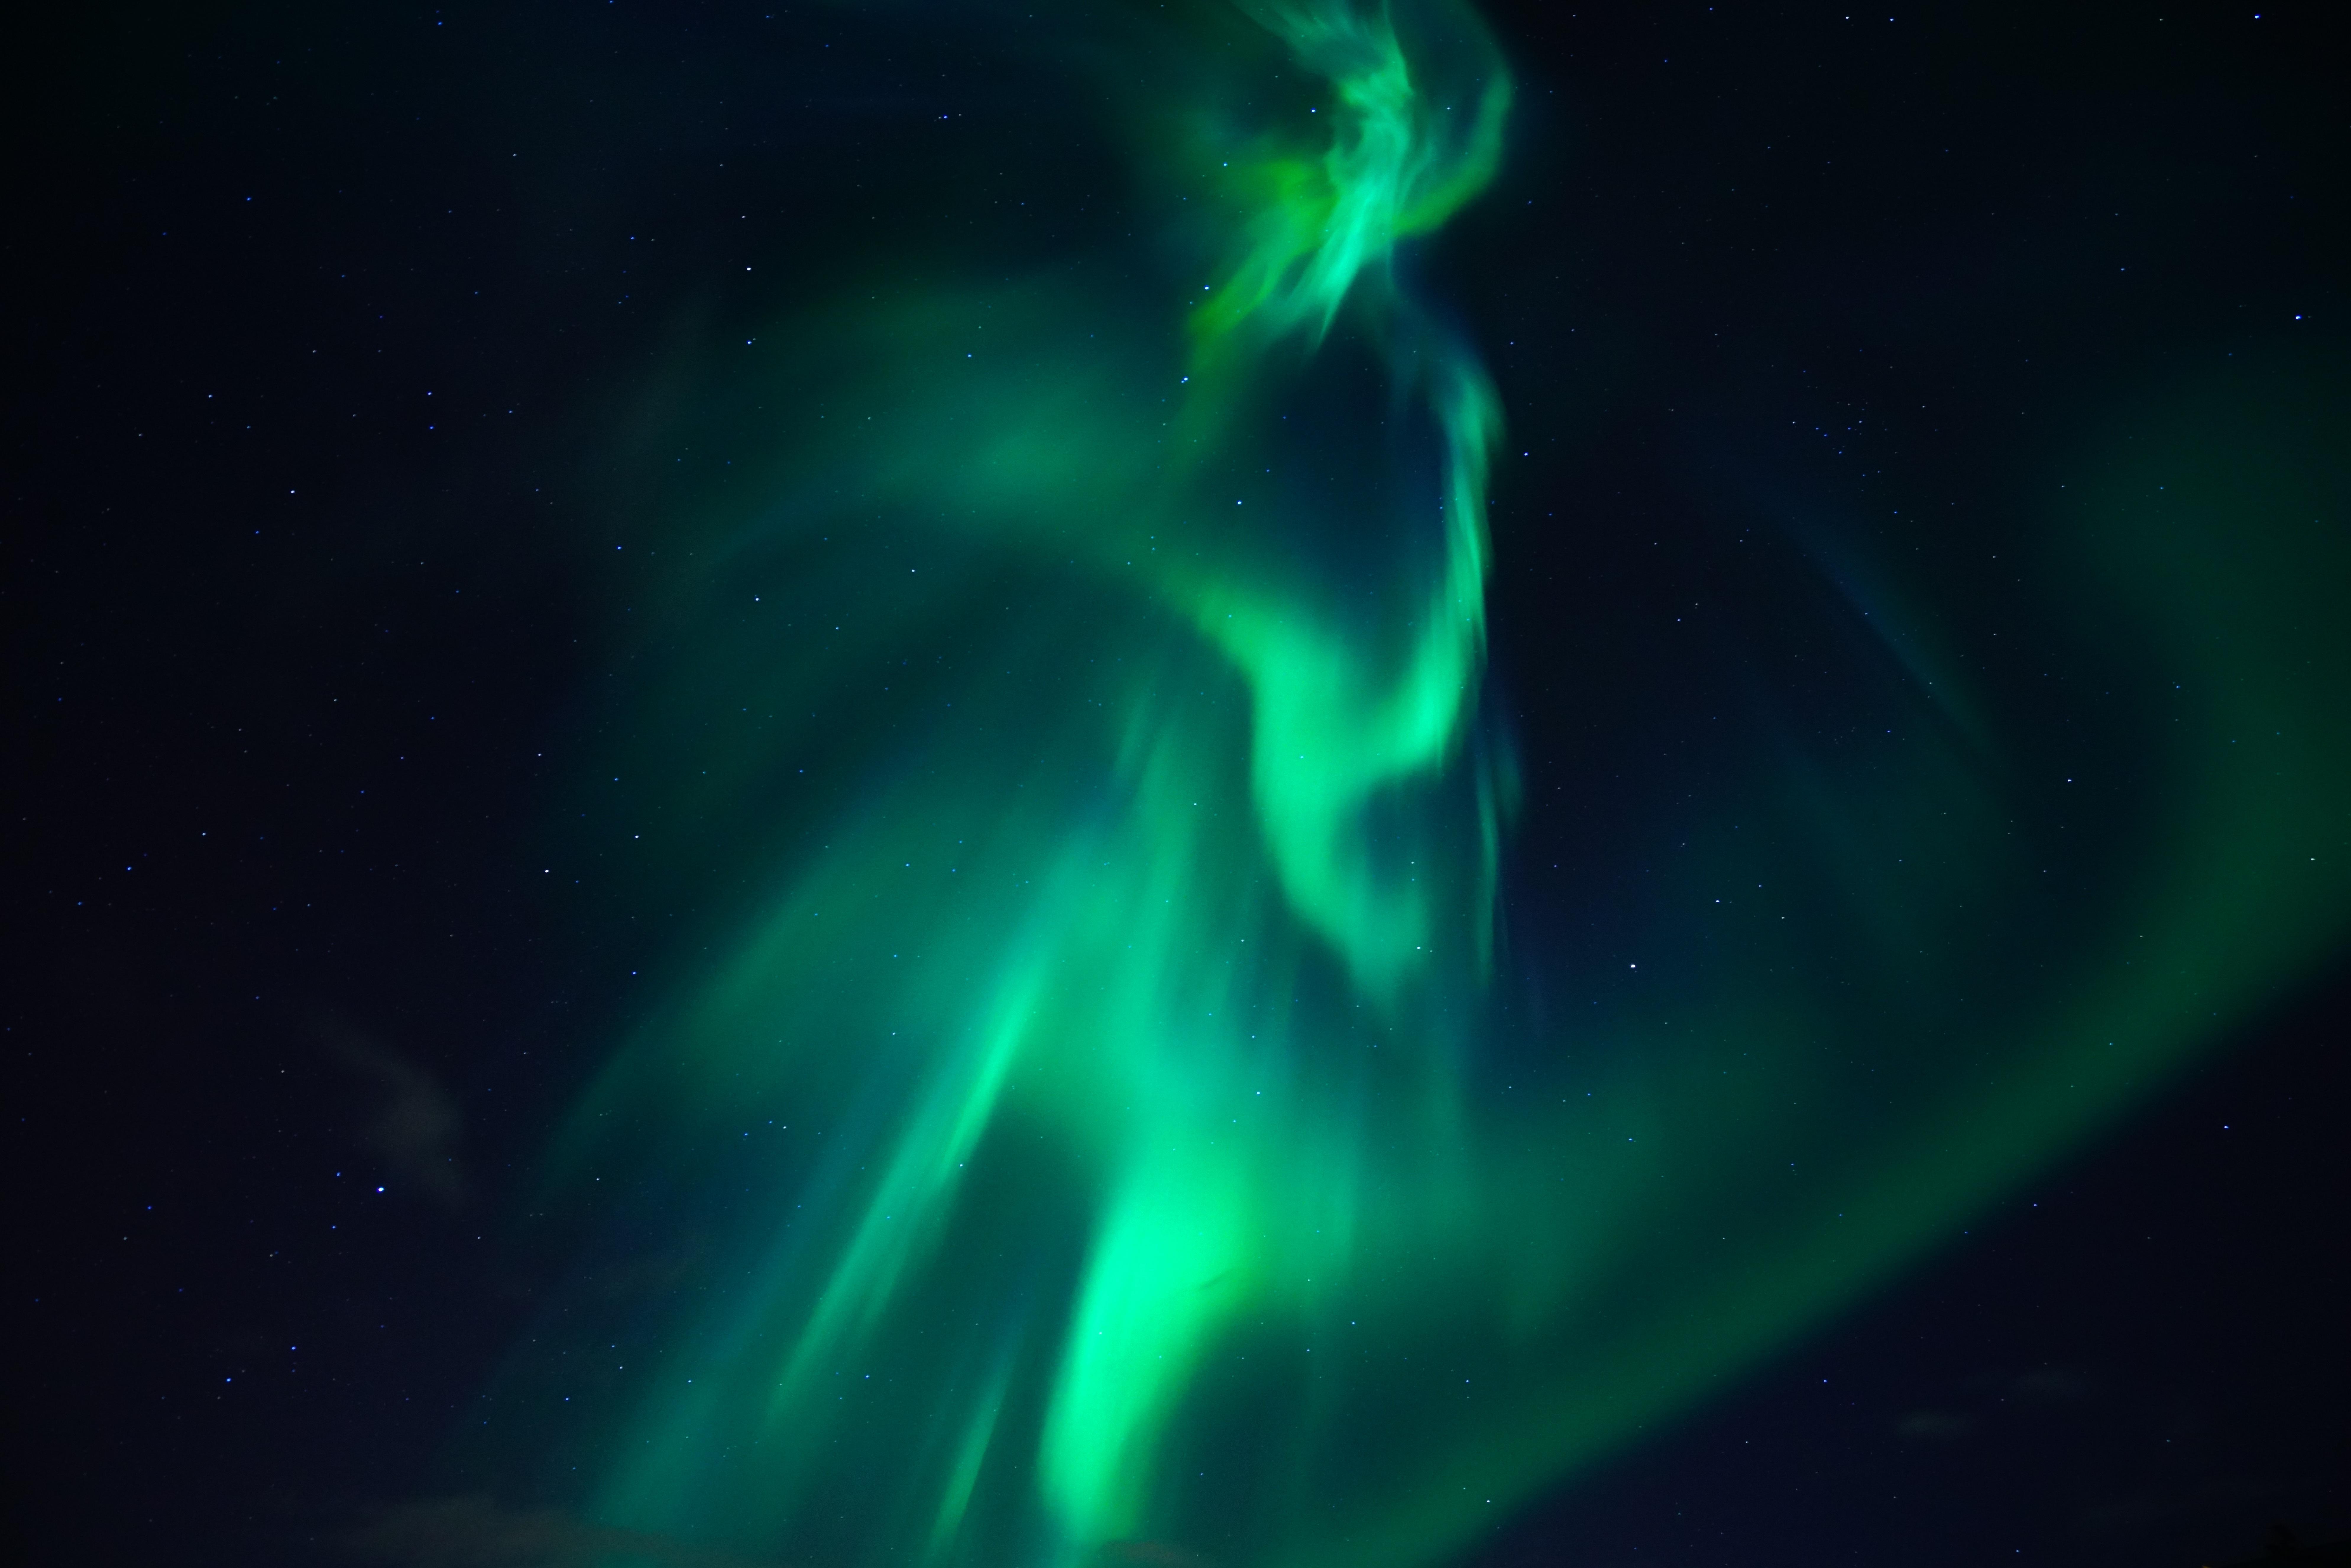 Aurora Borealis Light Night Sky Stars 7952x5304